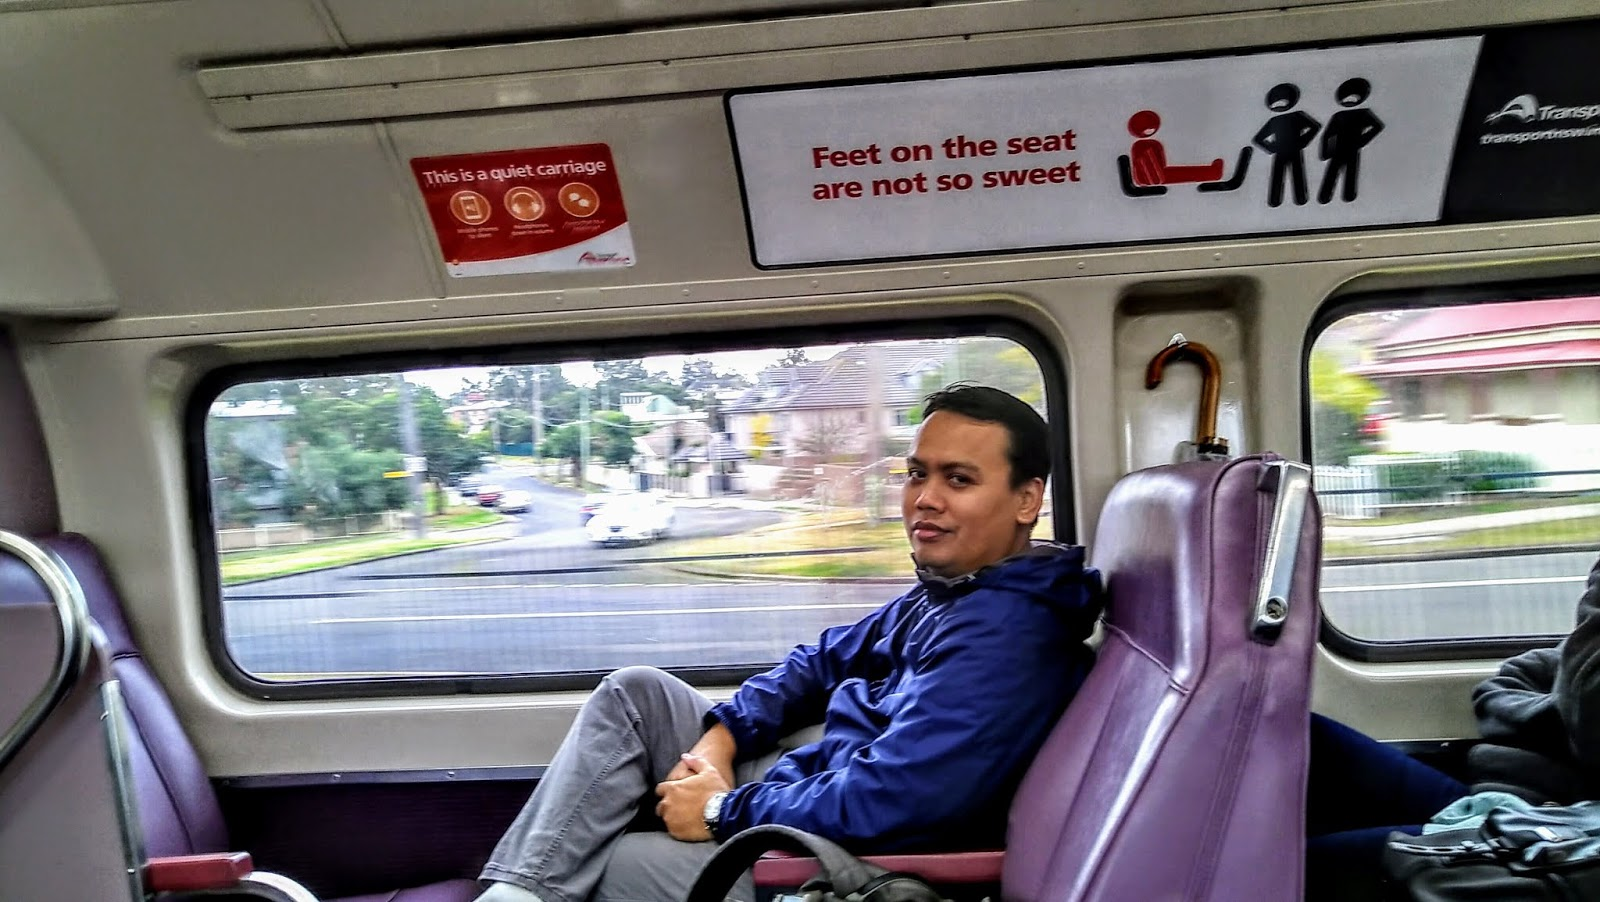 Kereta Antar Kota, MRT, Sydney, New South Wales, Australia, irfan-room.com